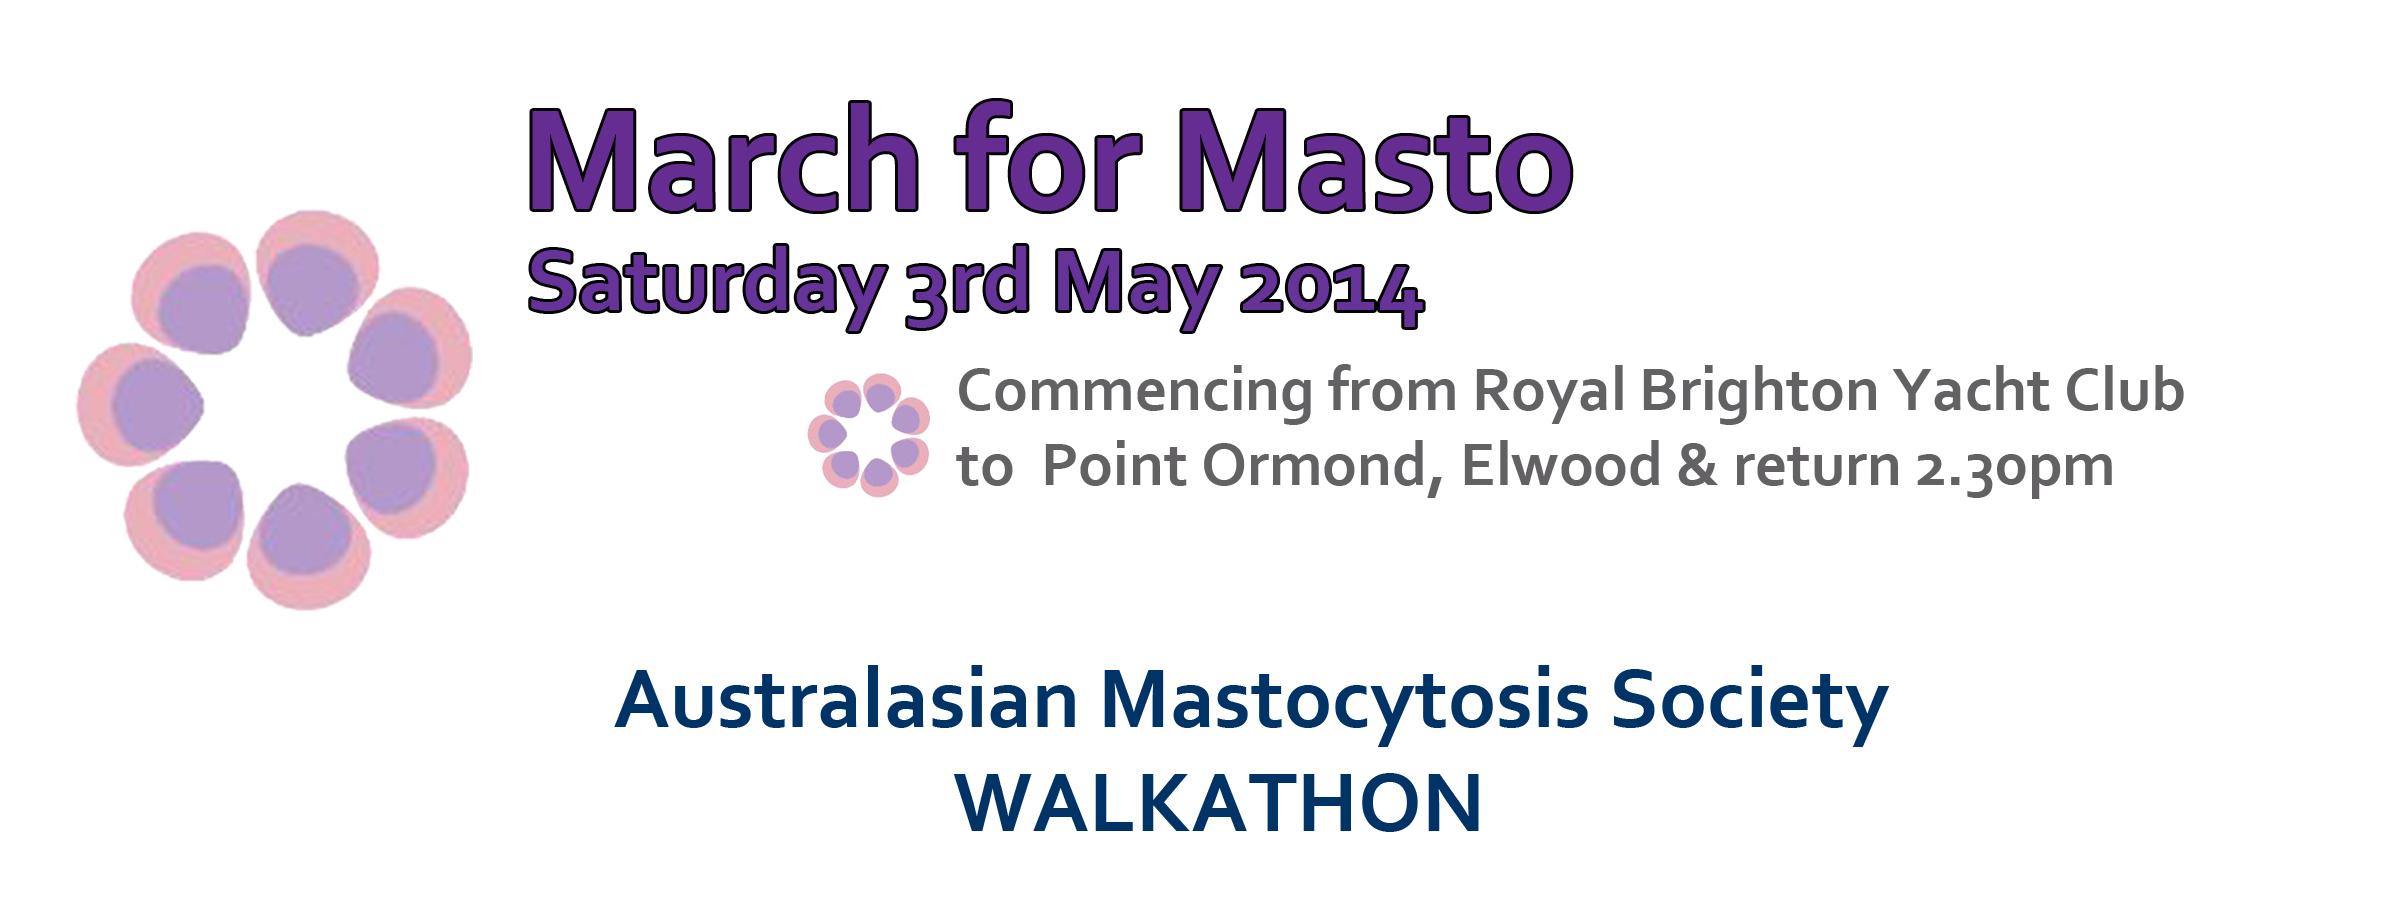 March to Masto